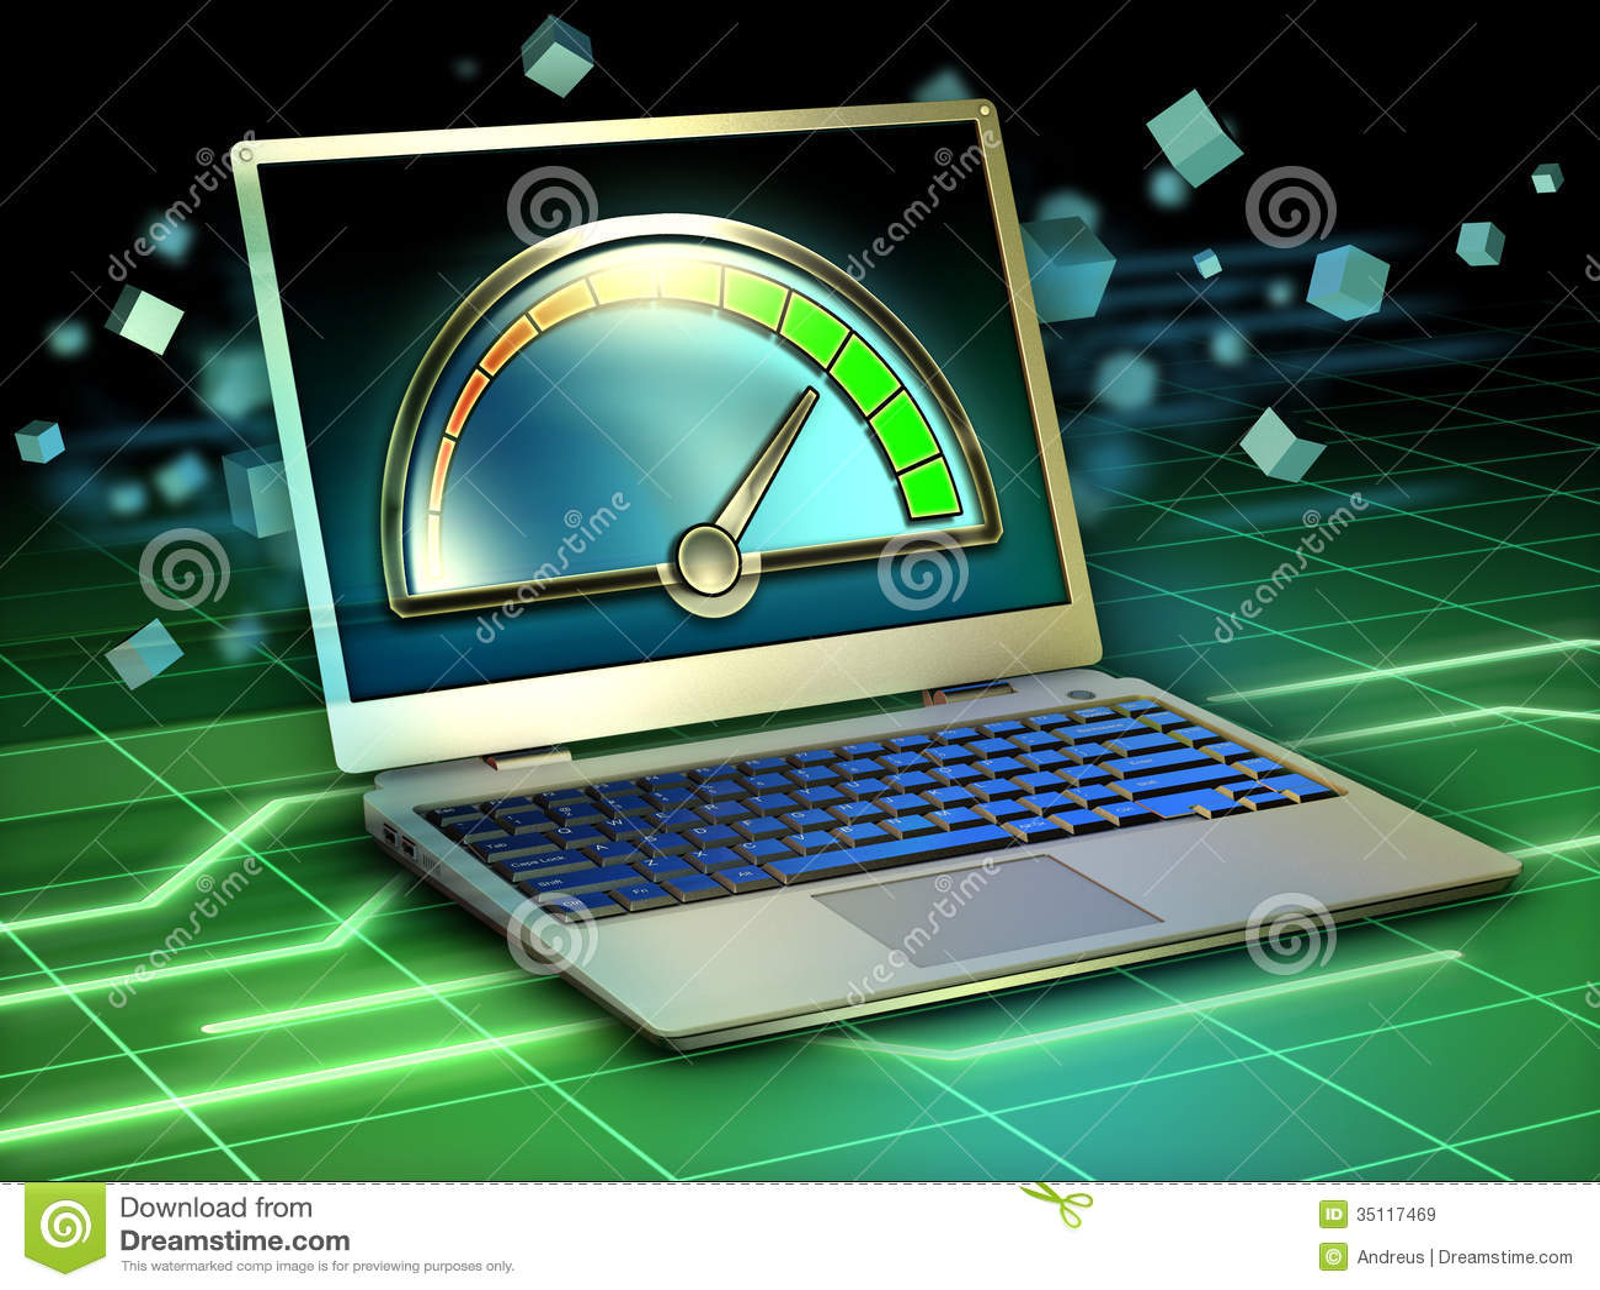 Laptop Performance Royalty Free Stock Images Image 35117469